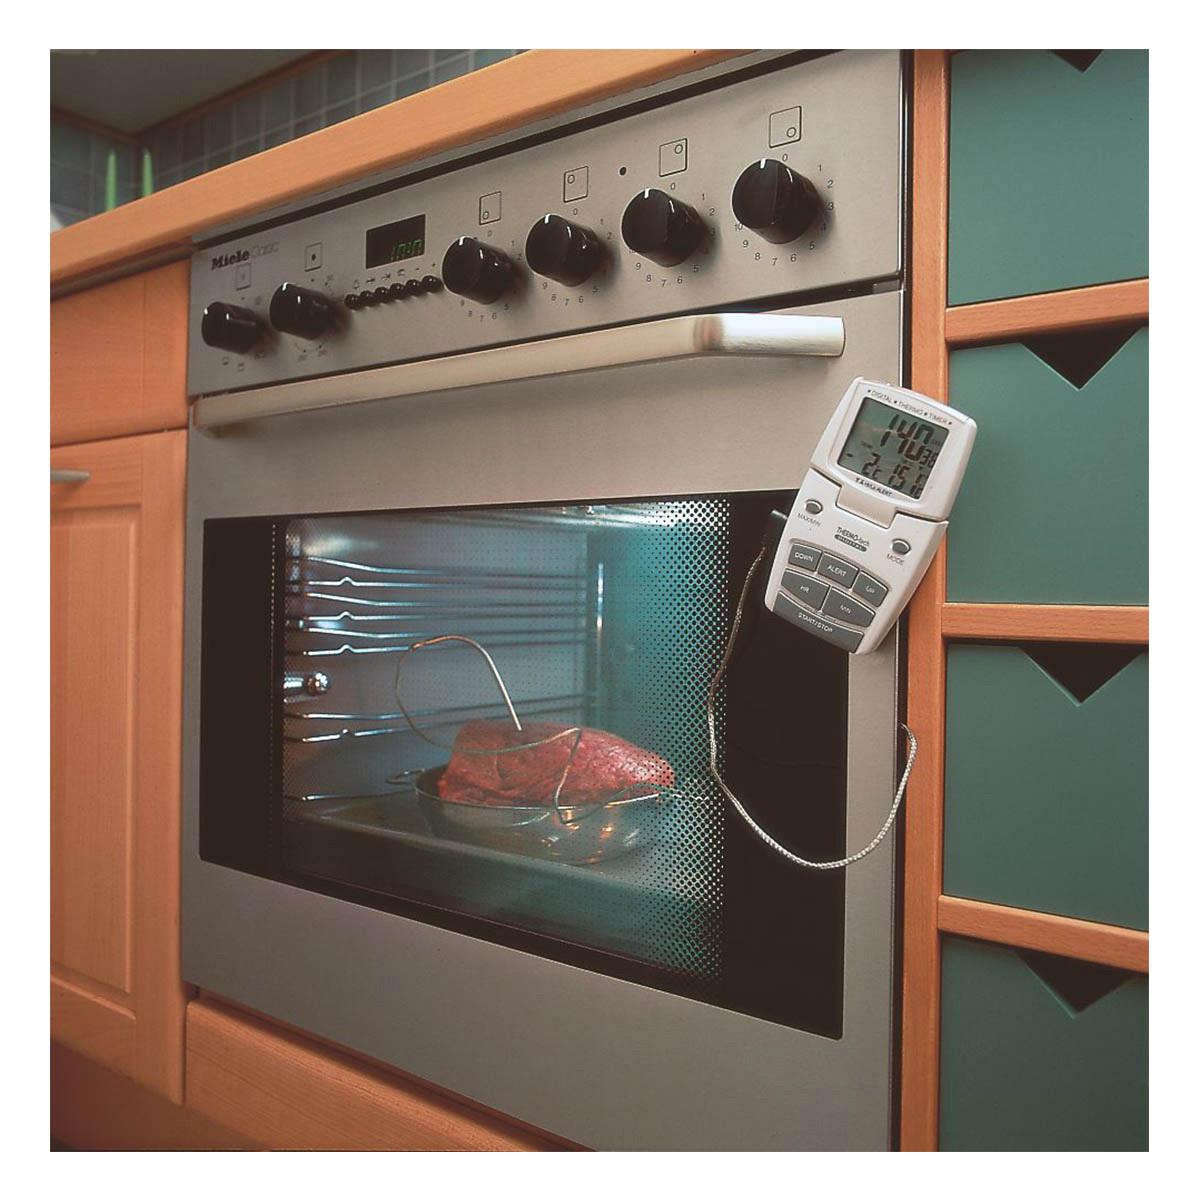 14-1500-digitales-bratenthermometer-anwendung1-1200x1200px.jpg